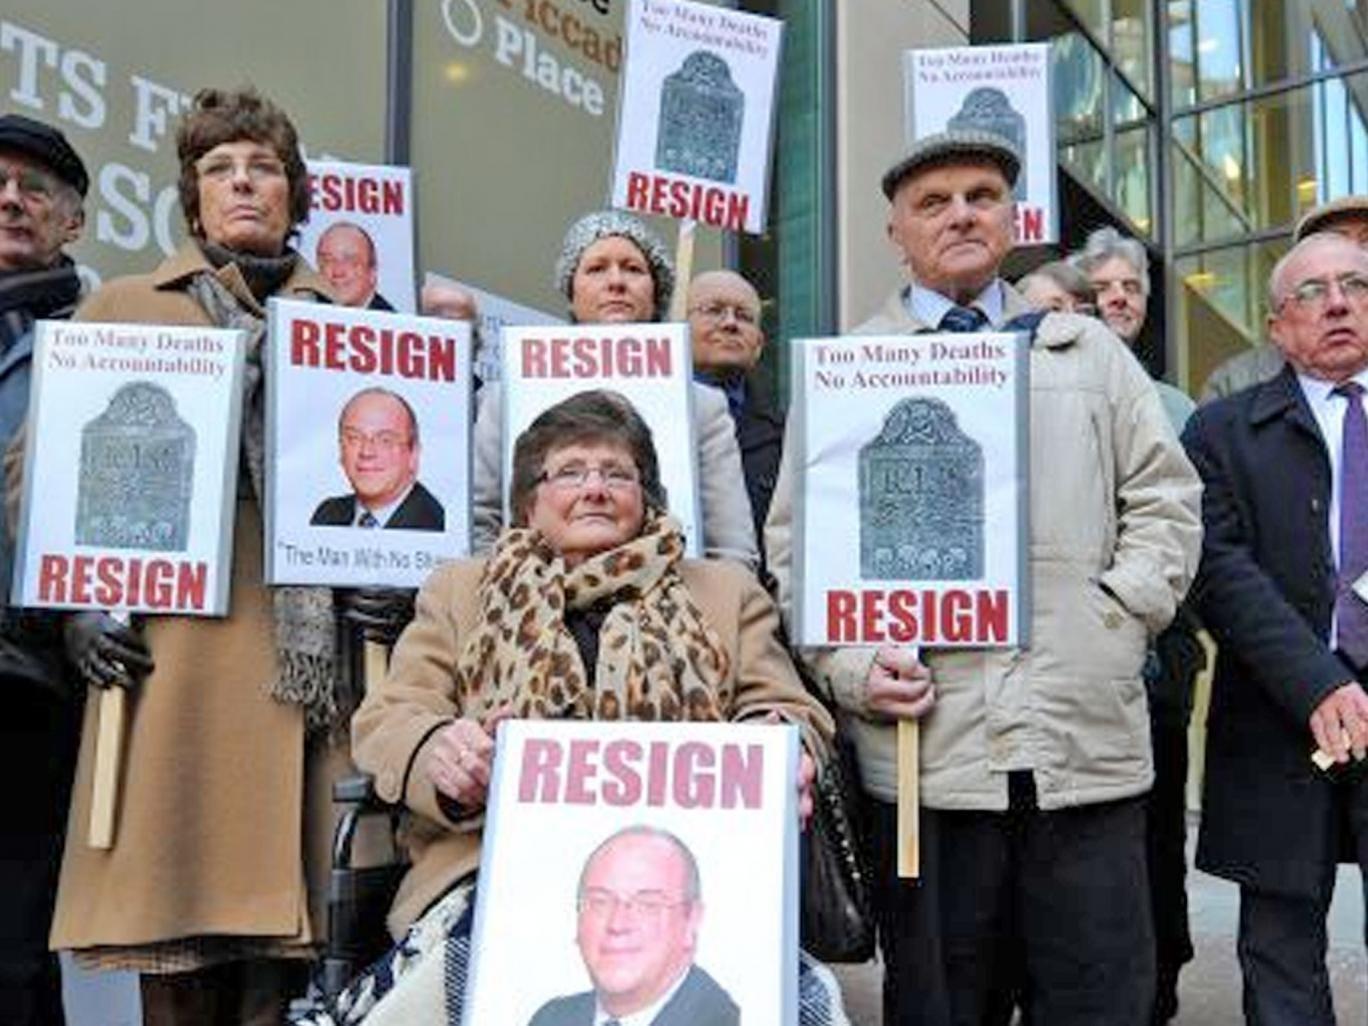 Protesters in London demand that Sir David Nicholson go